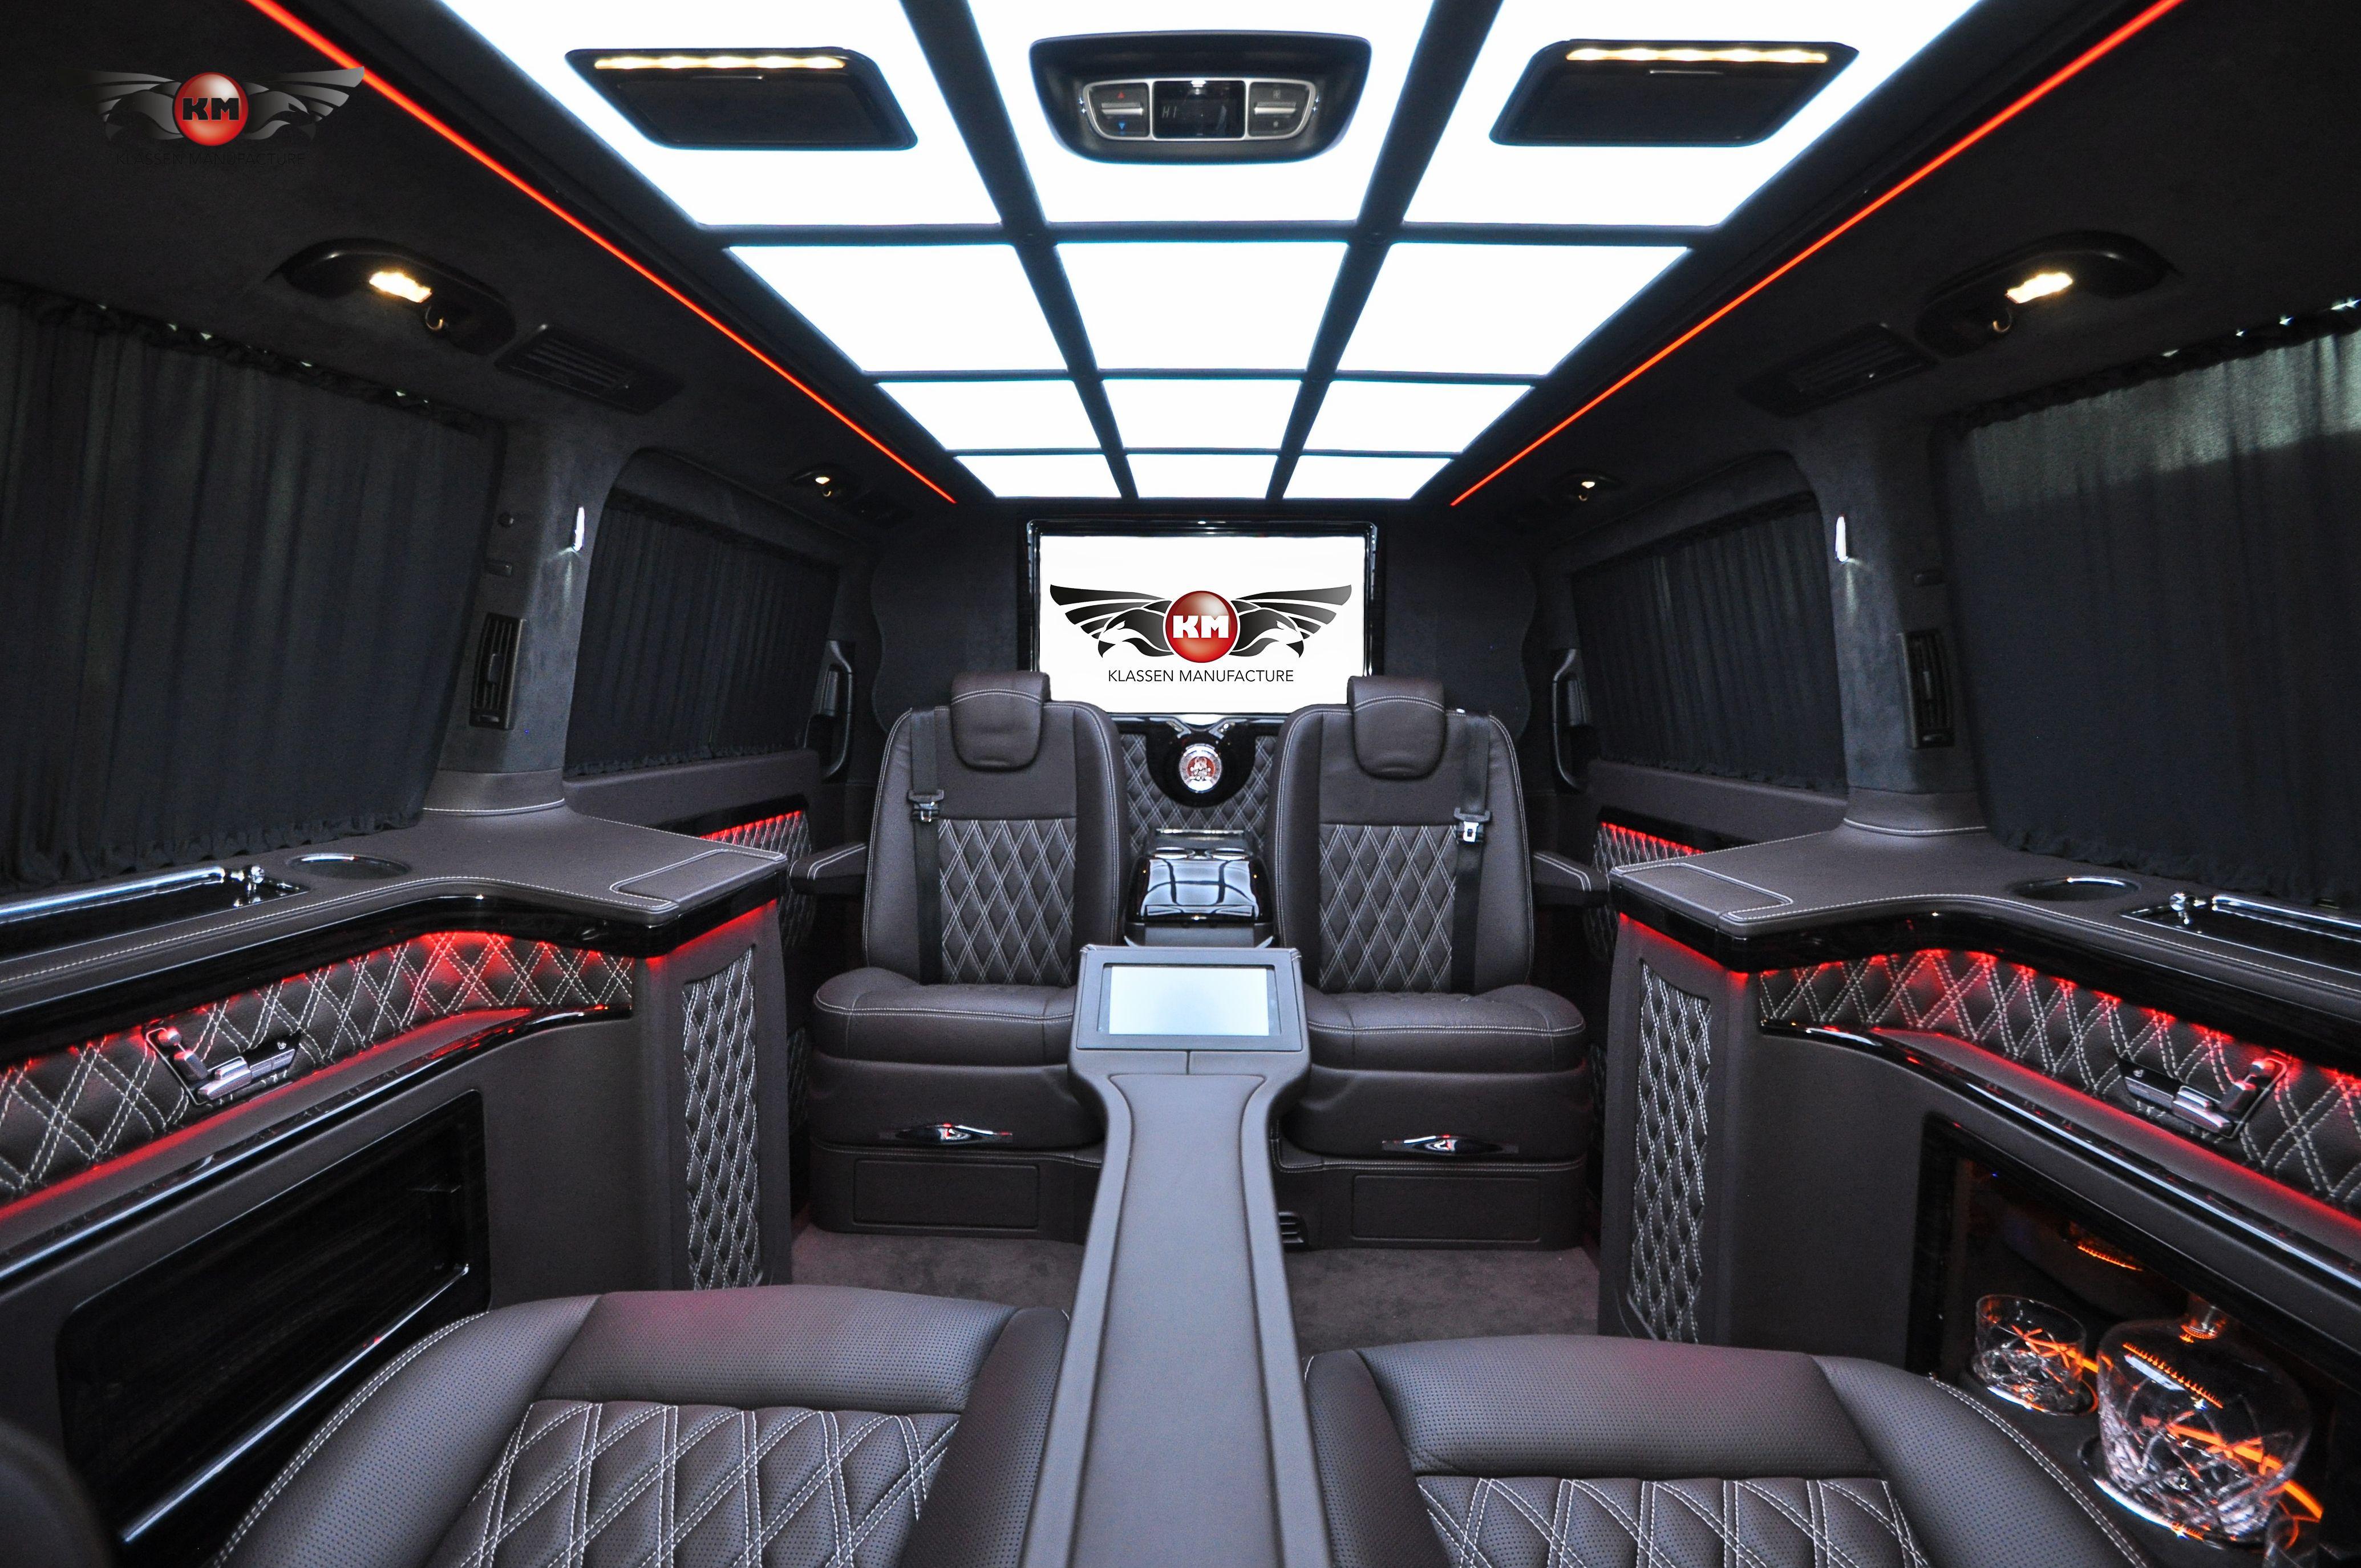 Klassen Manufacture Luxury Vip Cars And Vans With German Quality